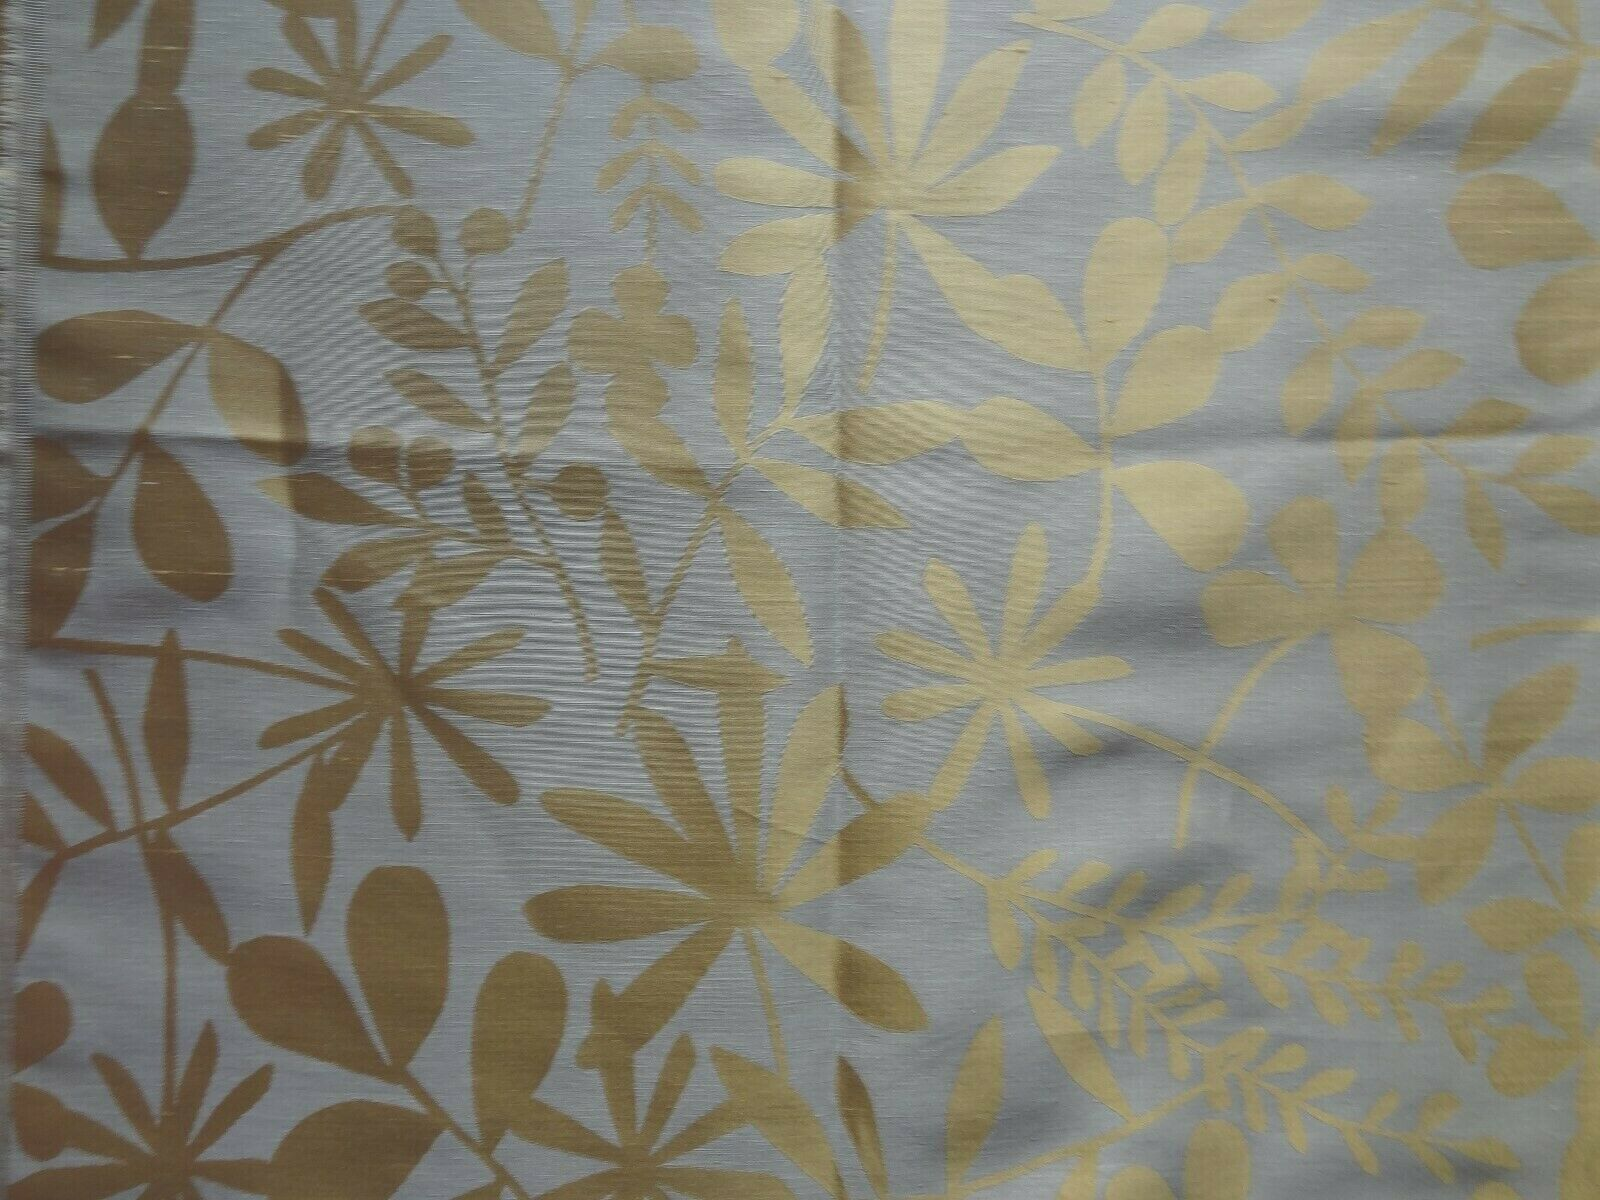 VILLA NOVA woven HONESTY LEAF 4.6 metres curtain Blind fabric SOFT Gold